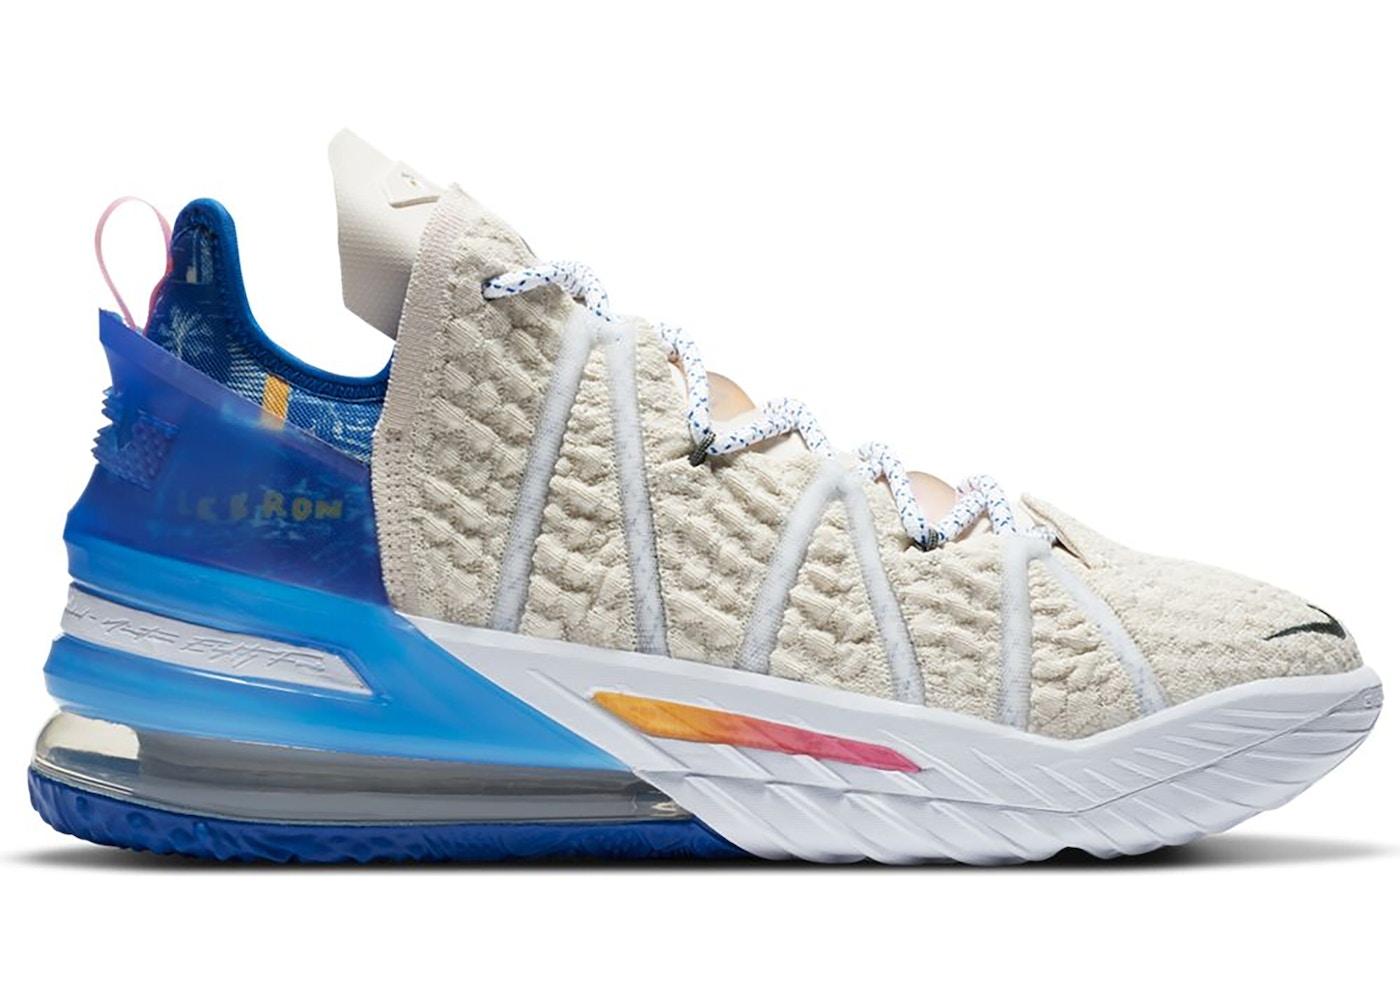 Nike Lebron 18 Los Angeles By Day Db8148 200